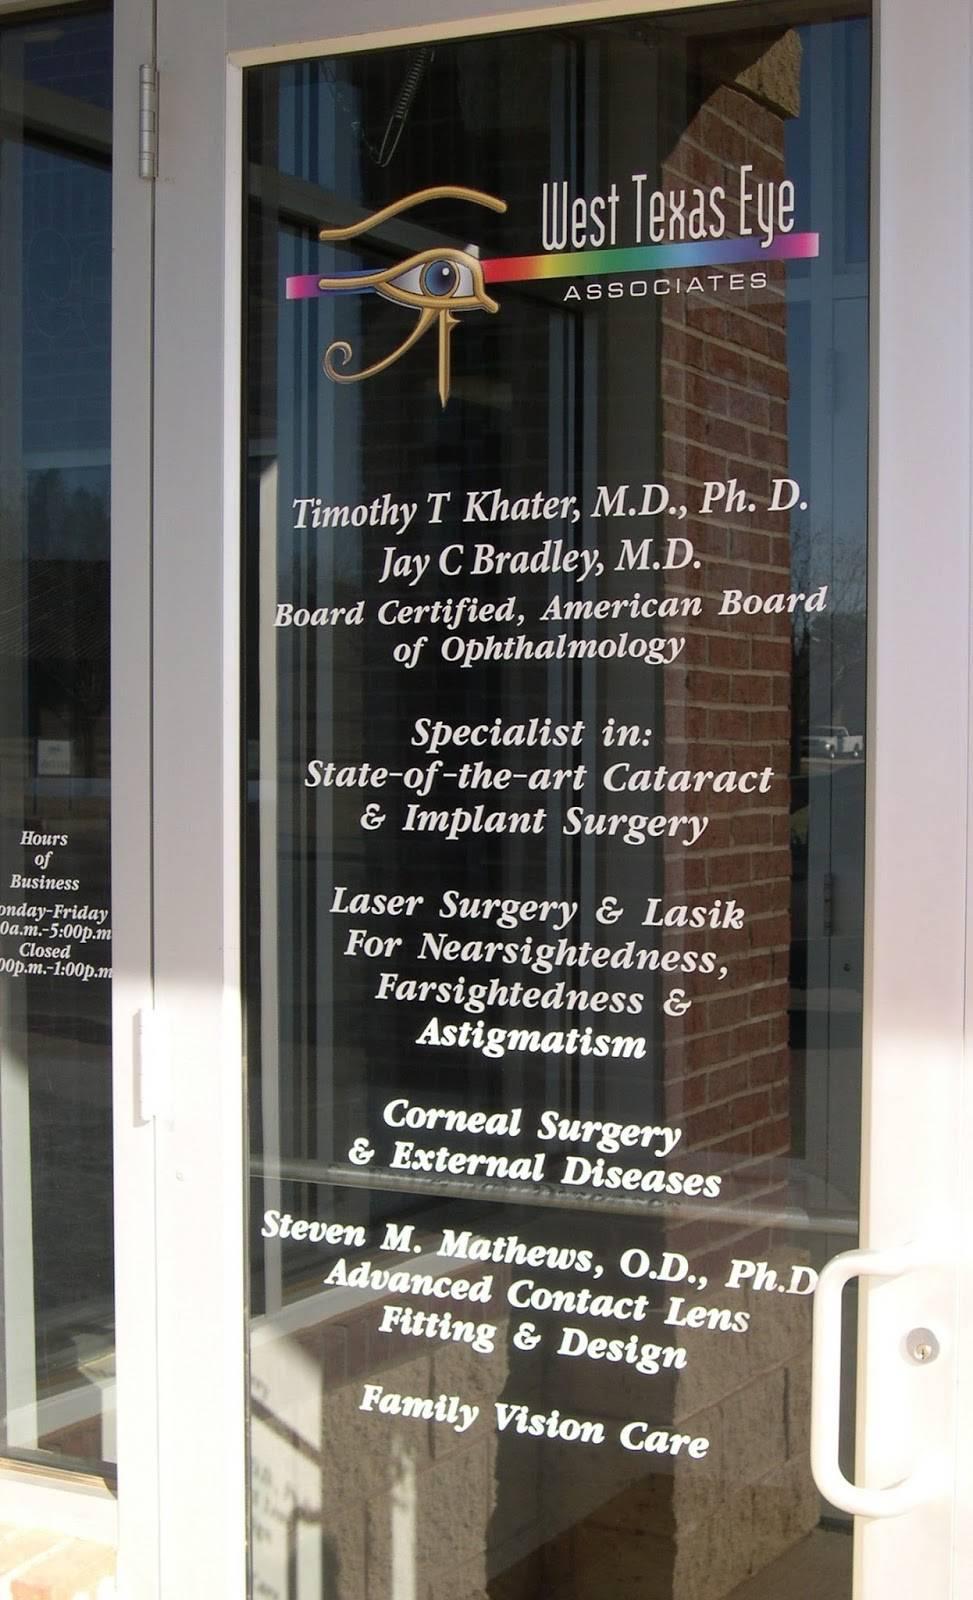 West Texas Eye Associates - health    Photo 8 of 8   Address: 12210 Quaker Ave, Lubbock, TX 79424, USA   Phone: (806) 792-5900